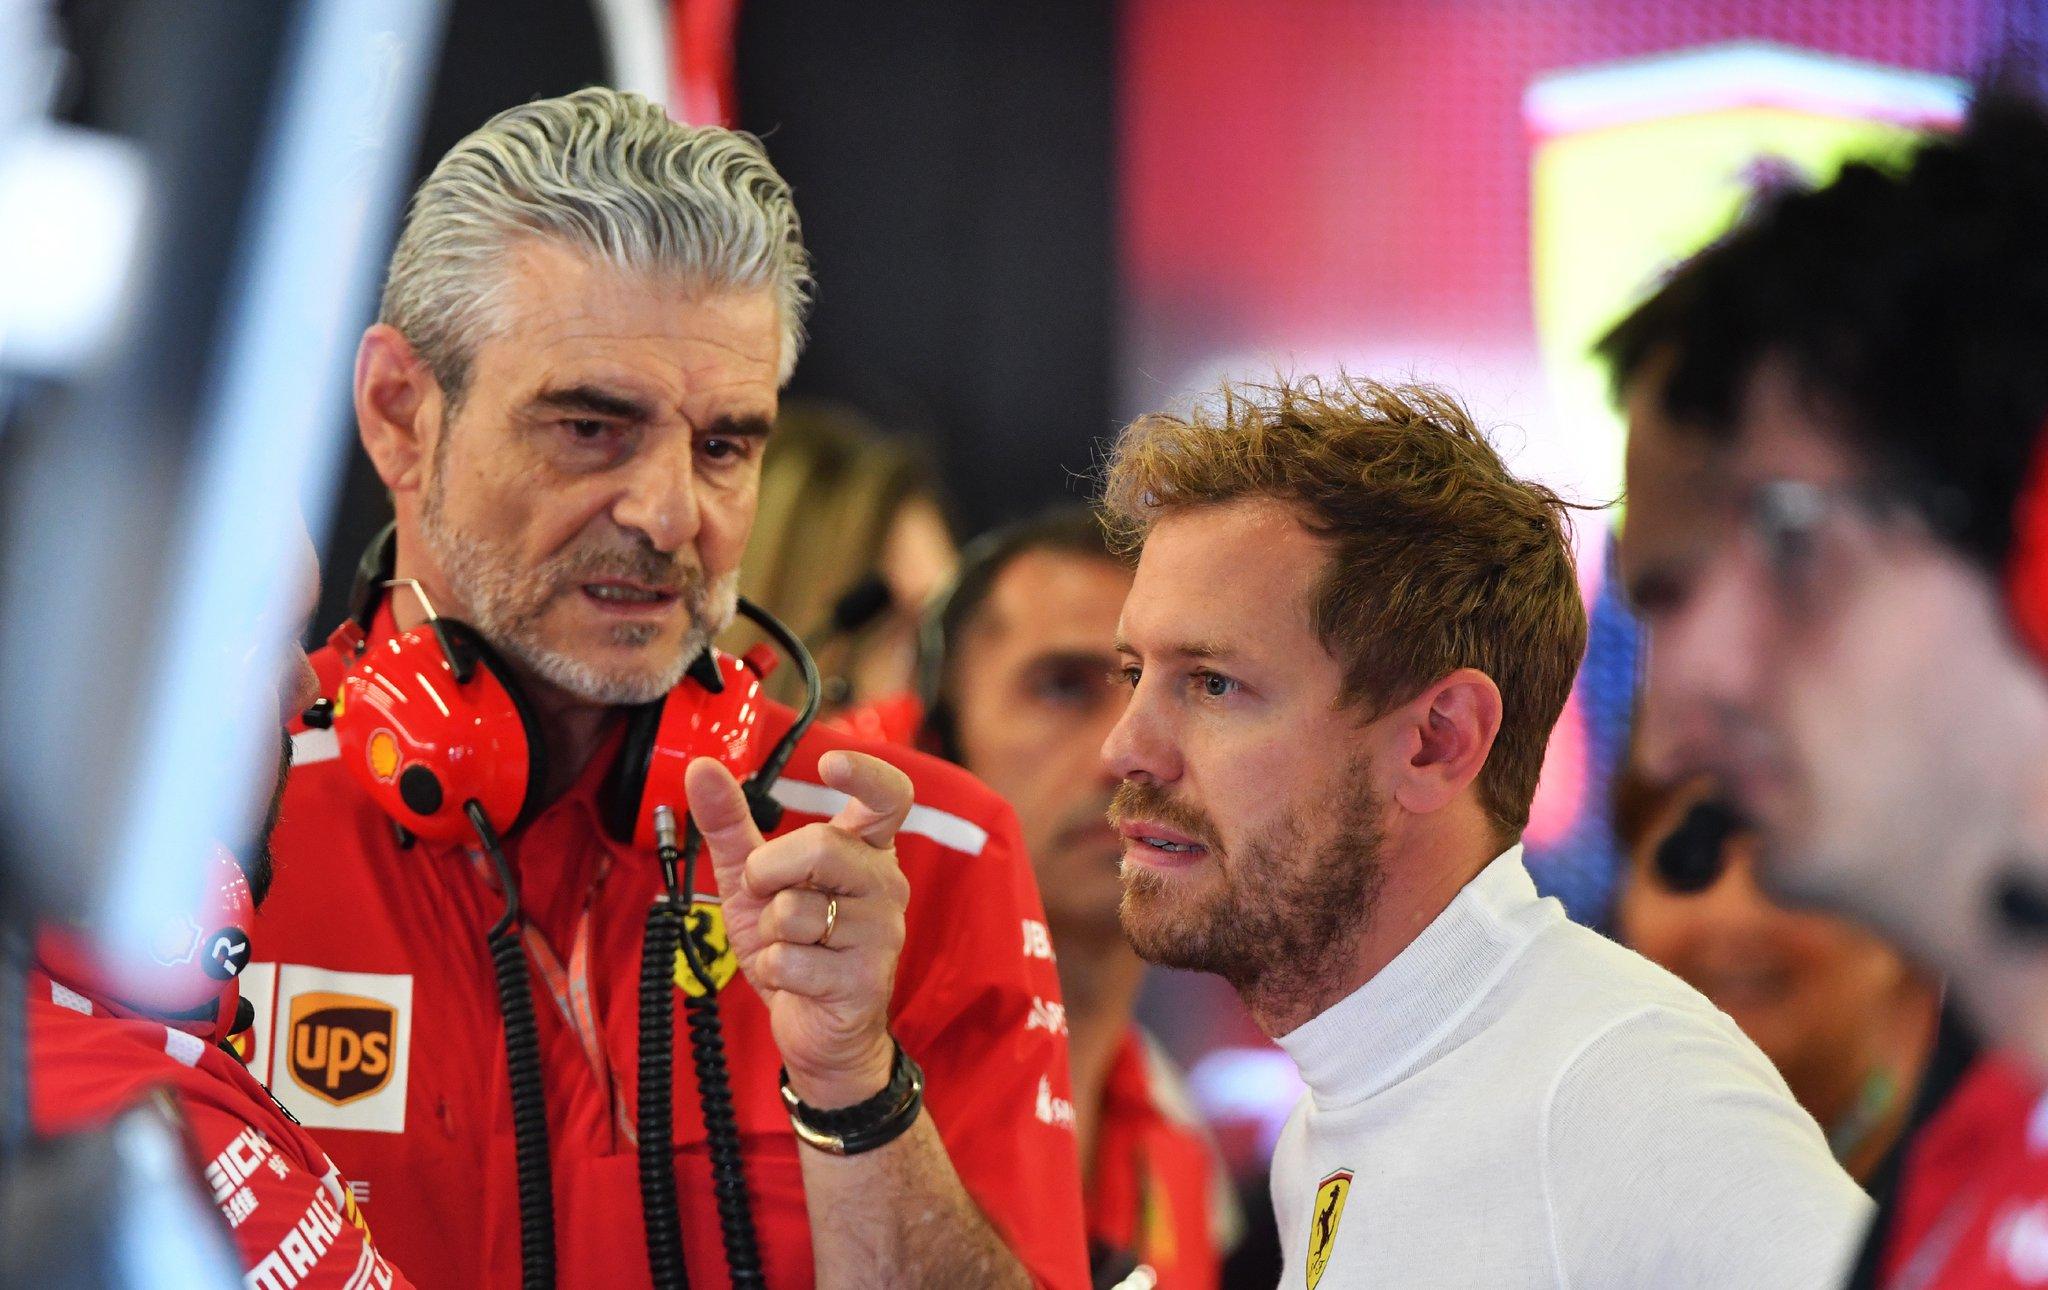 British Grand Prix FP2.jpg